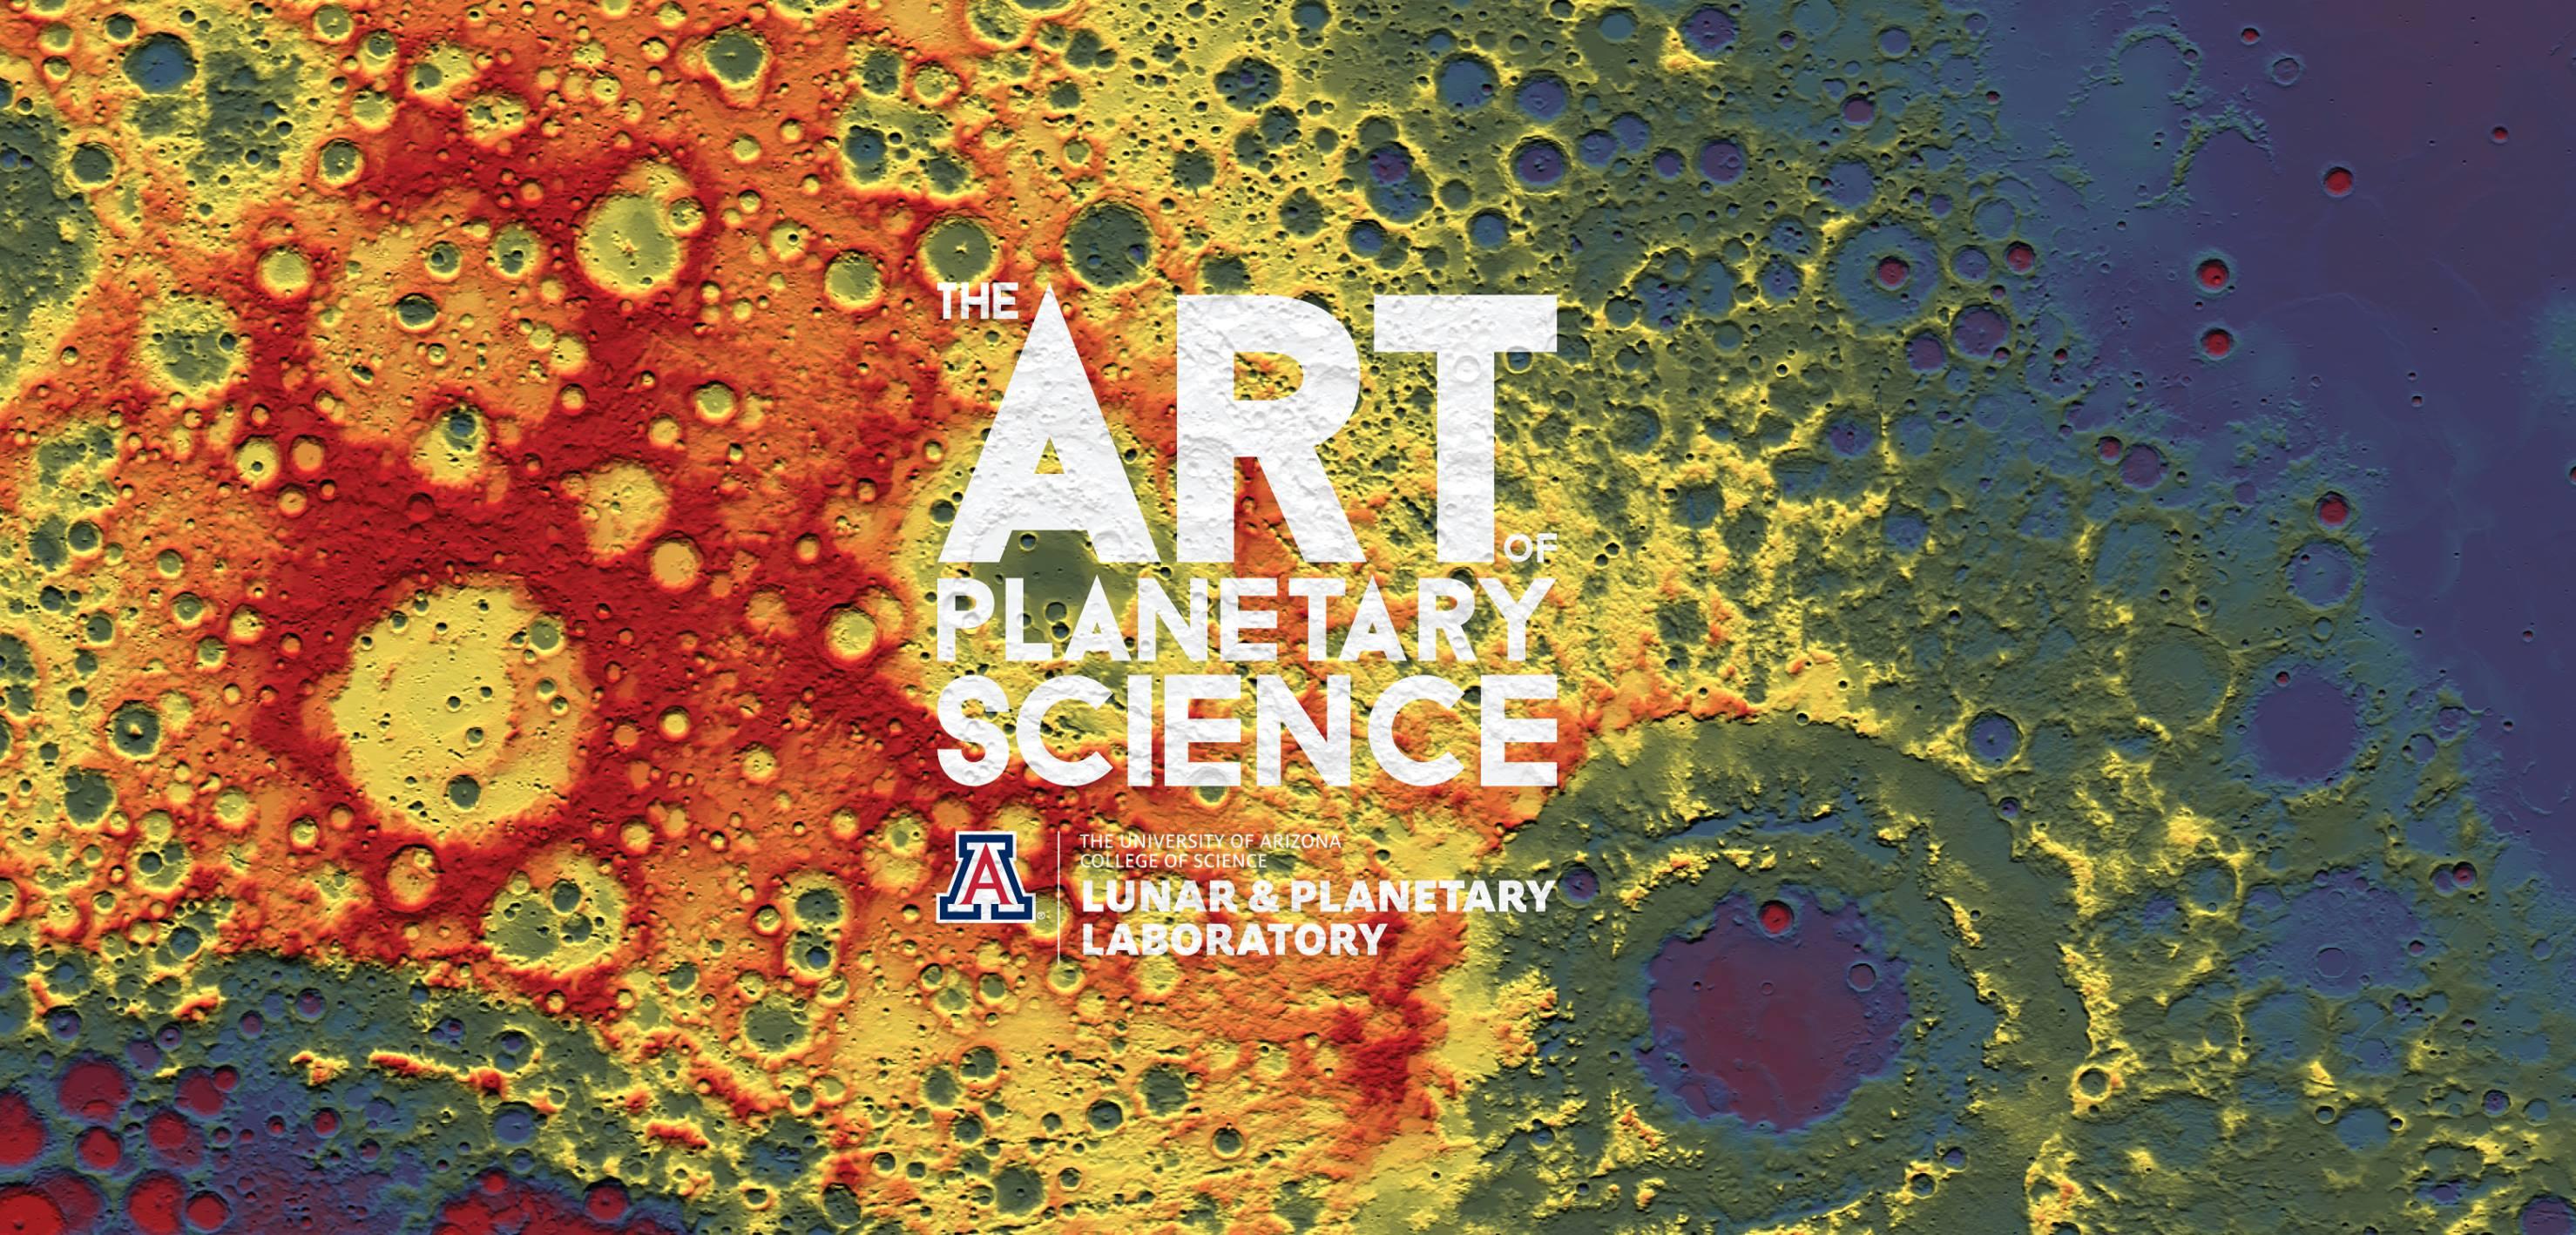 Art of Planetary Science logo